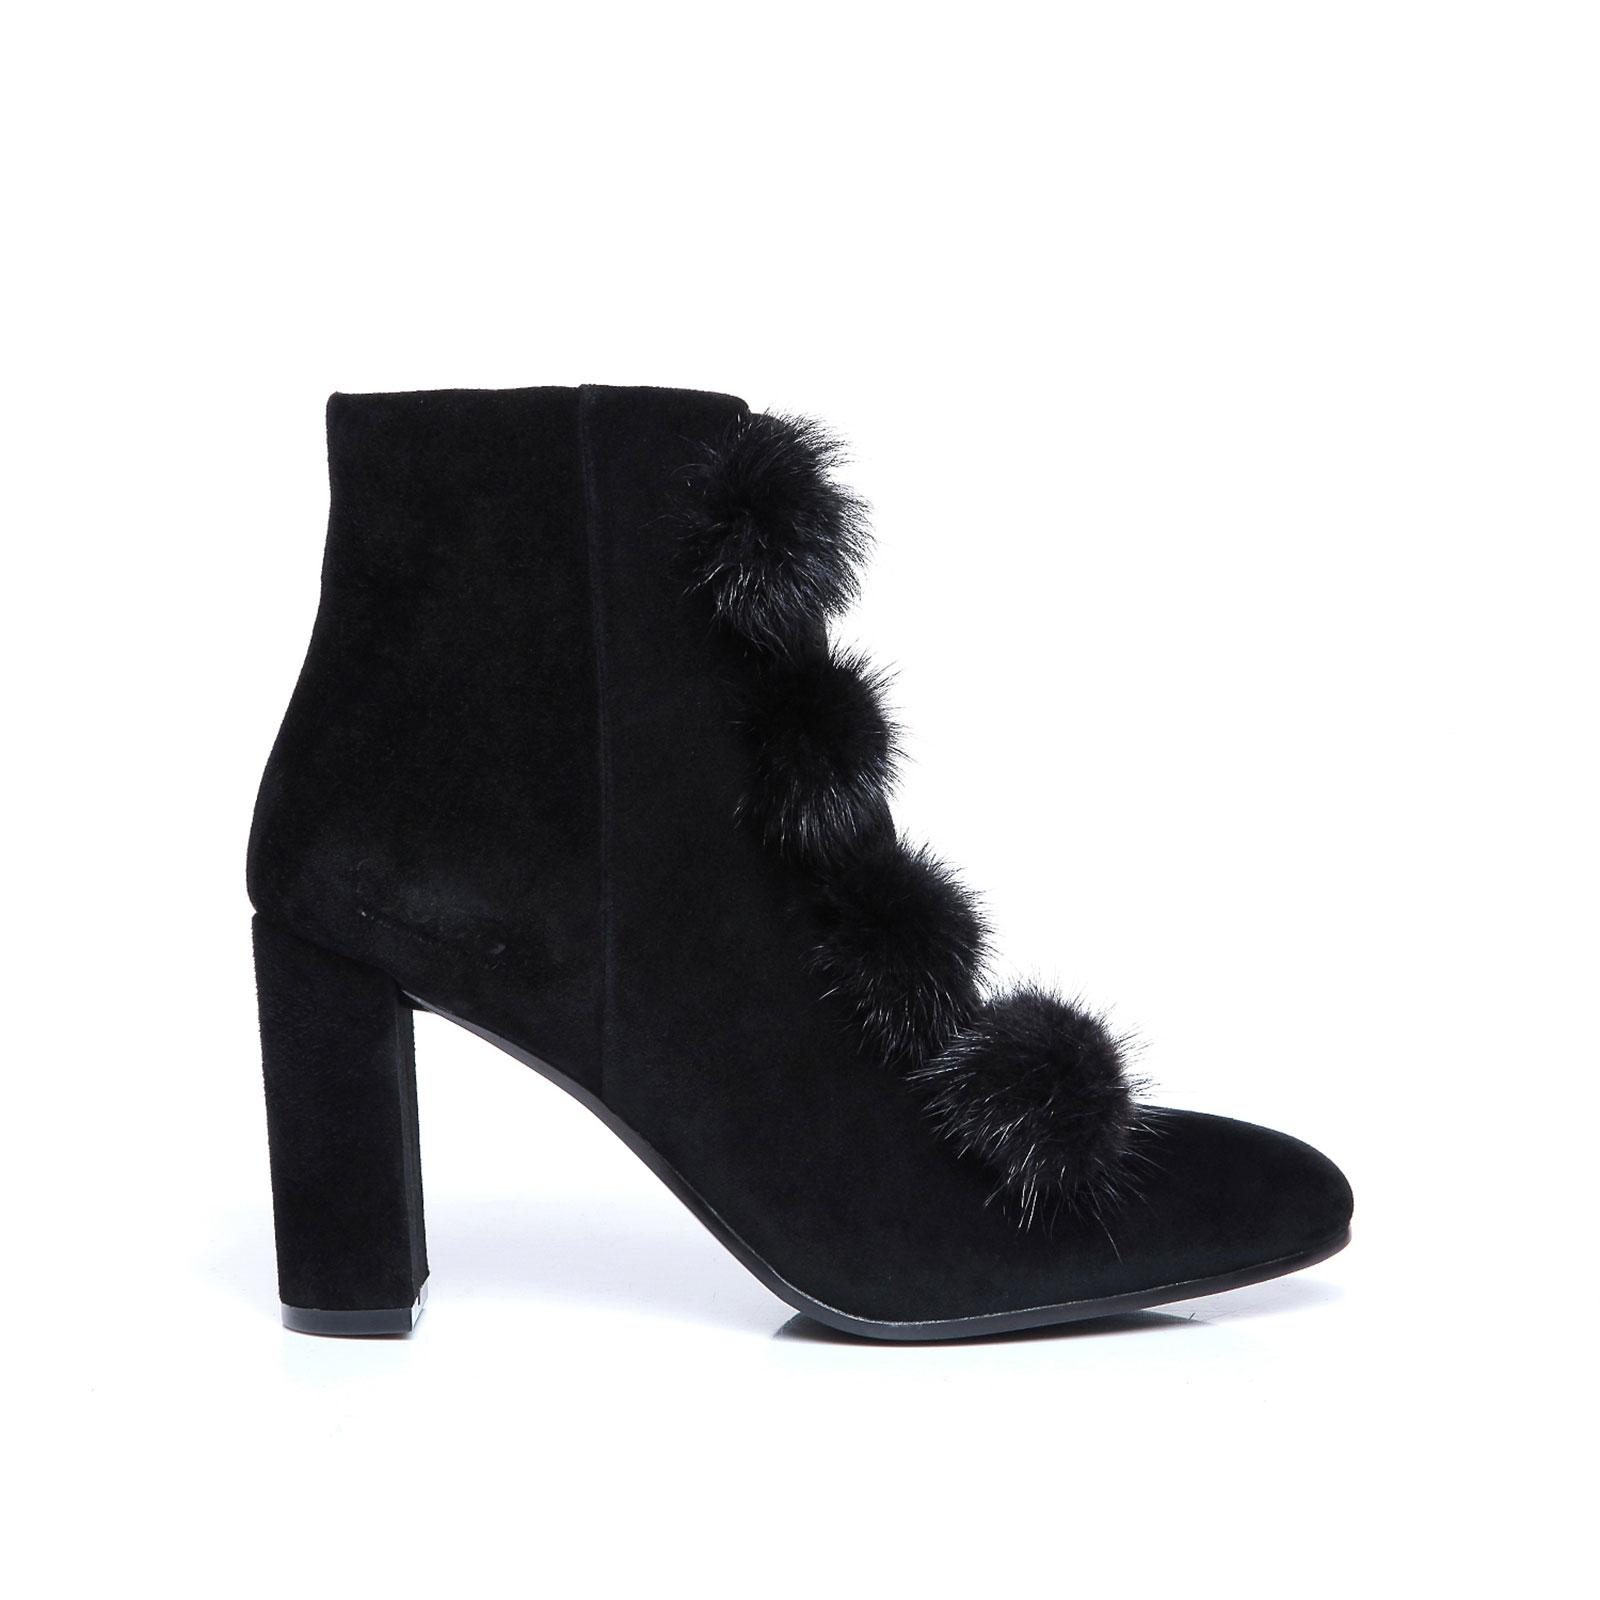 Image is loading UGG-Boots-Michelle-Ladies-High-Heel-Kid-Suede-